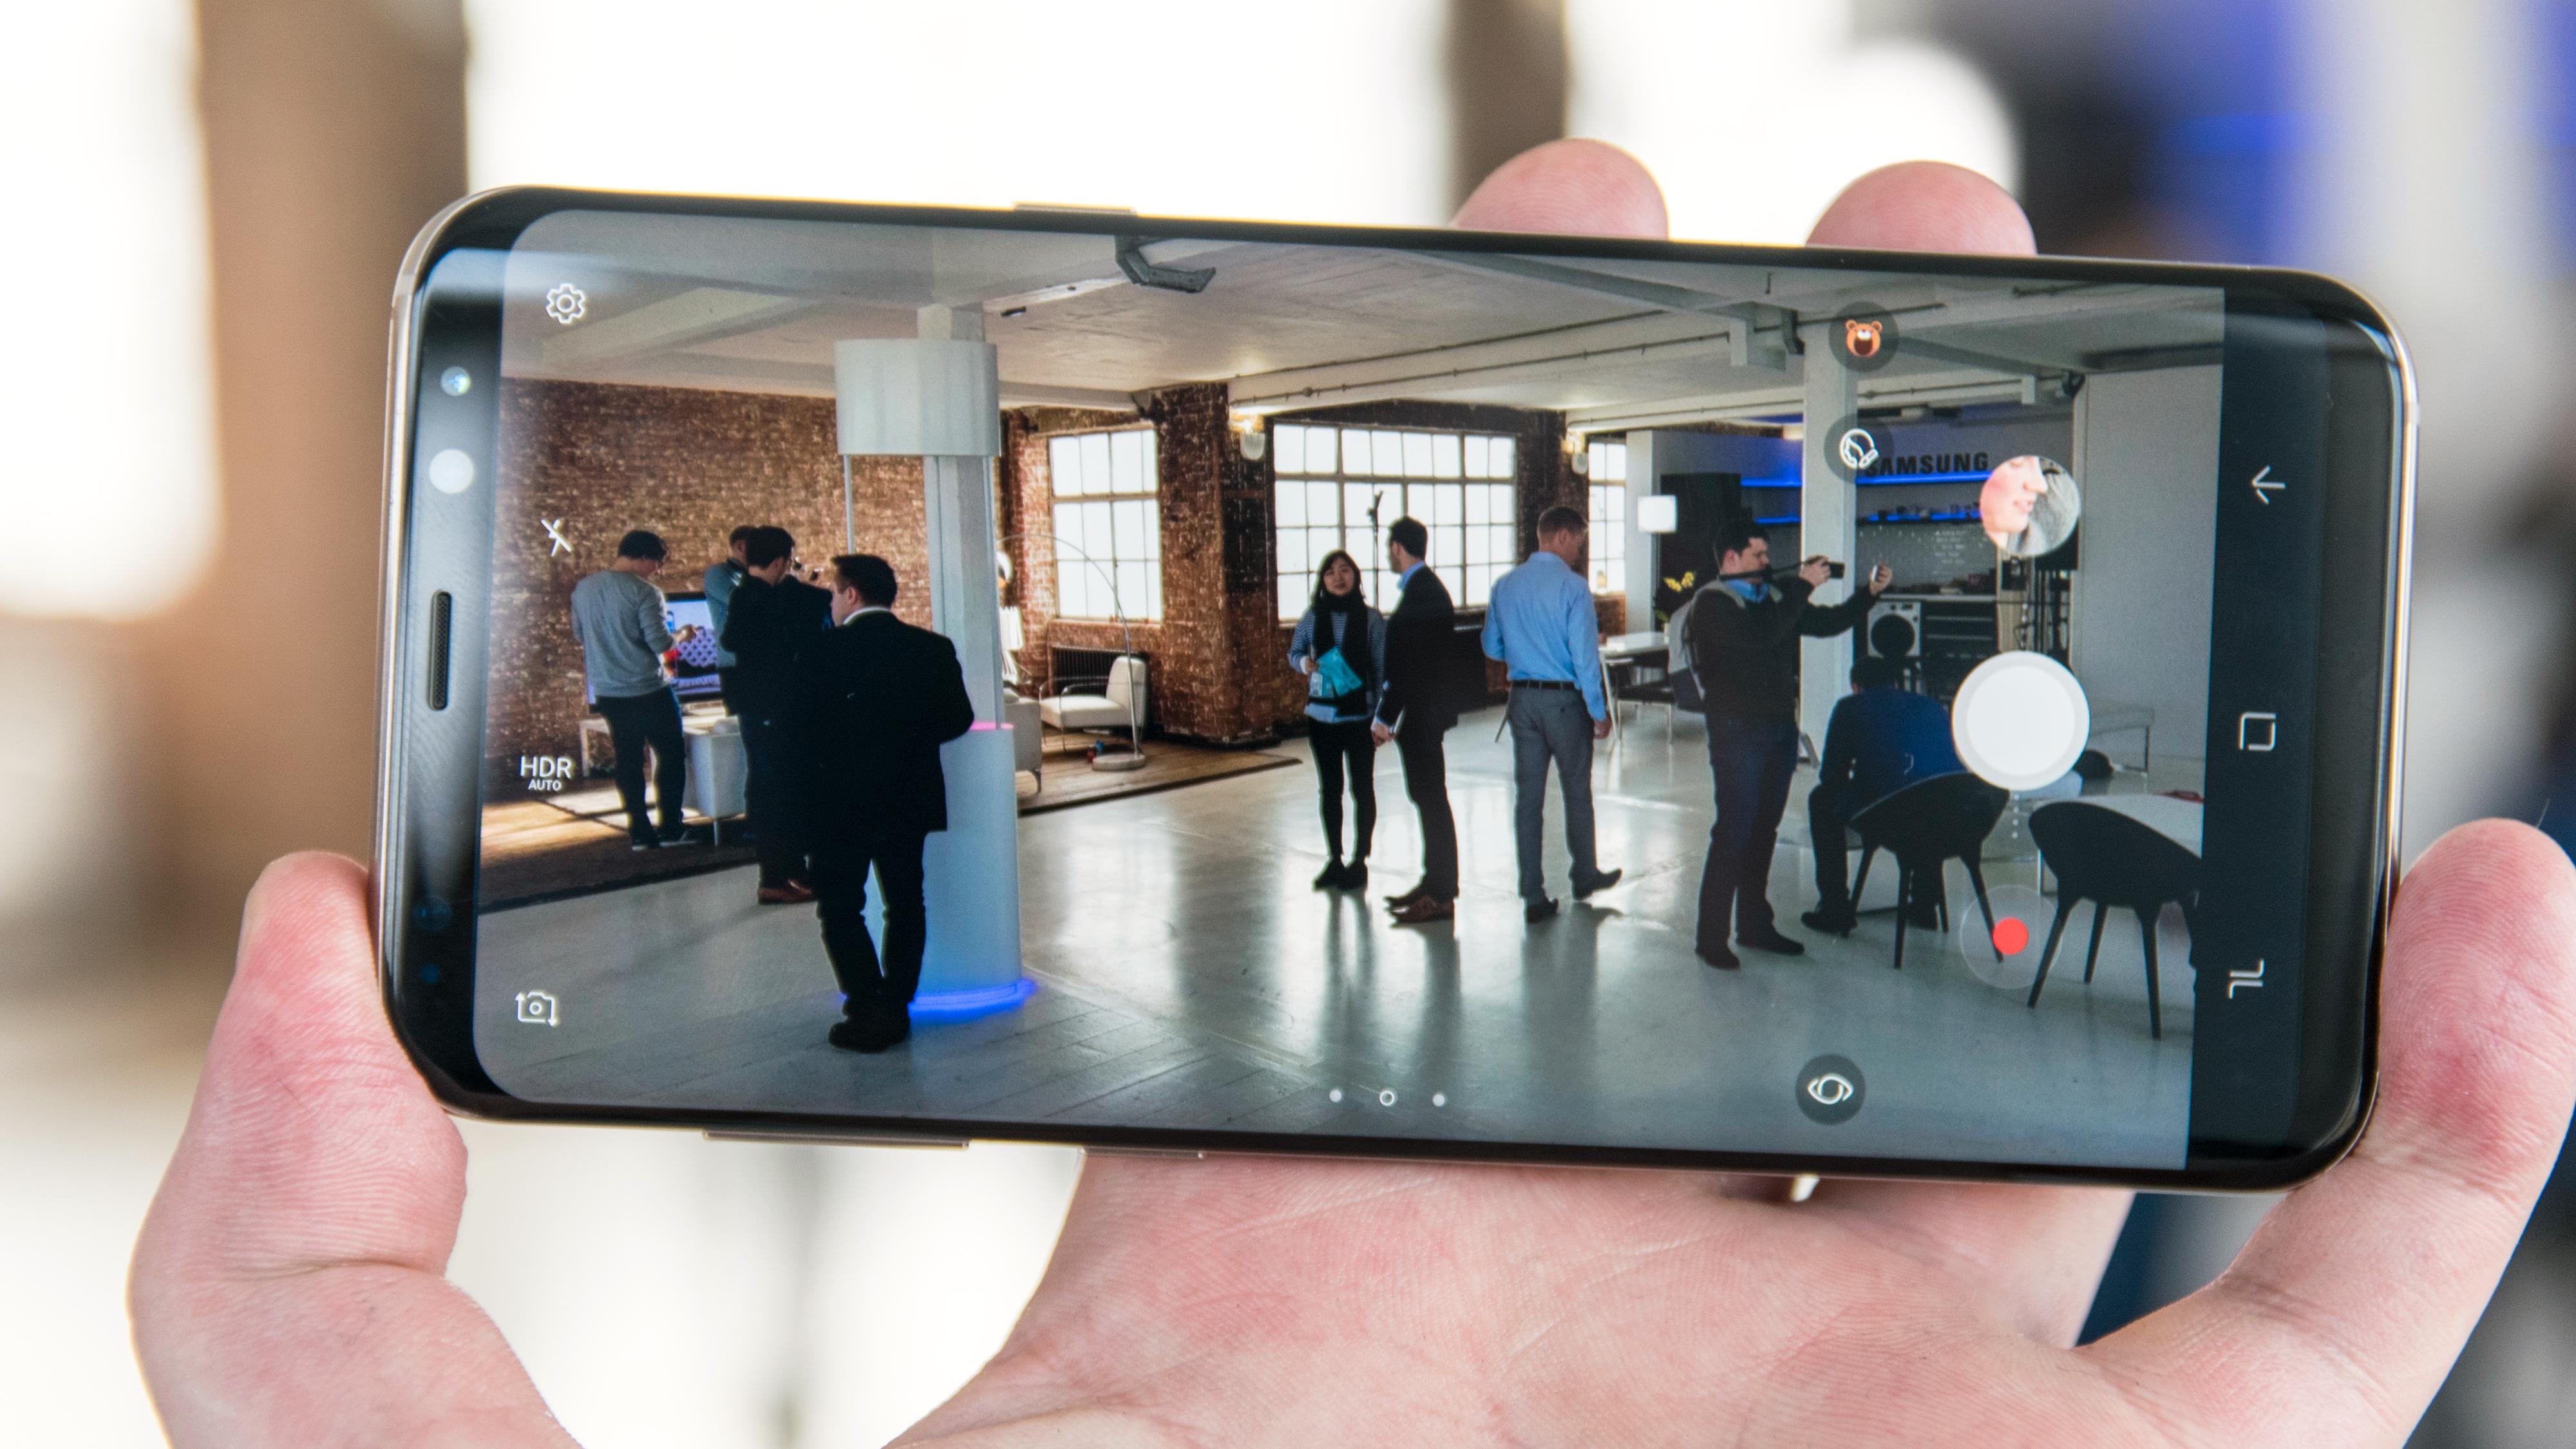 Galaxy S8 får en hyggeligere pris i Norge enn i andre land